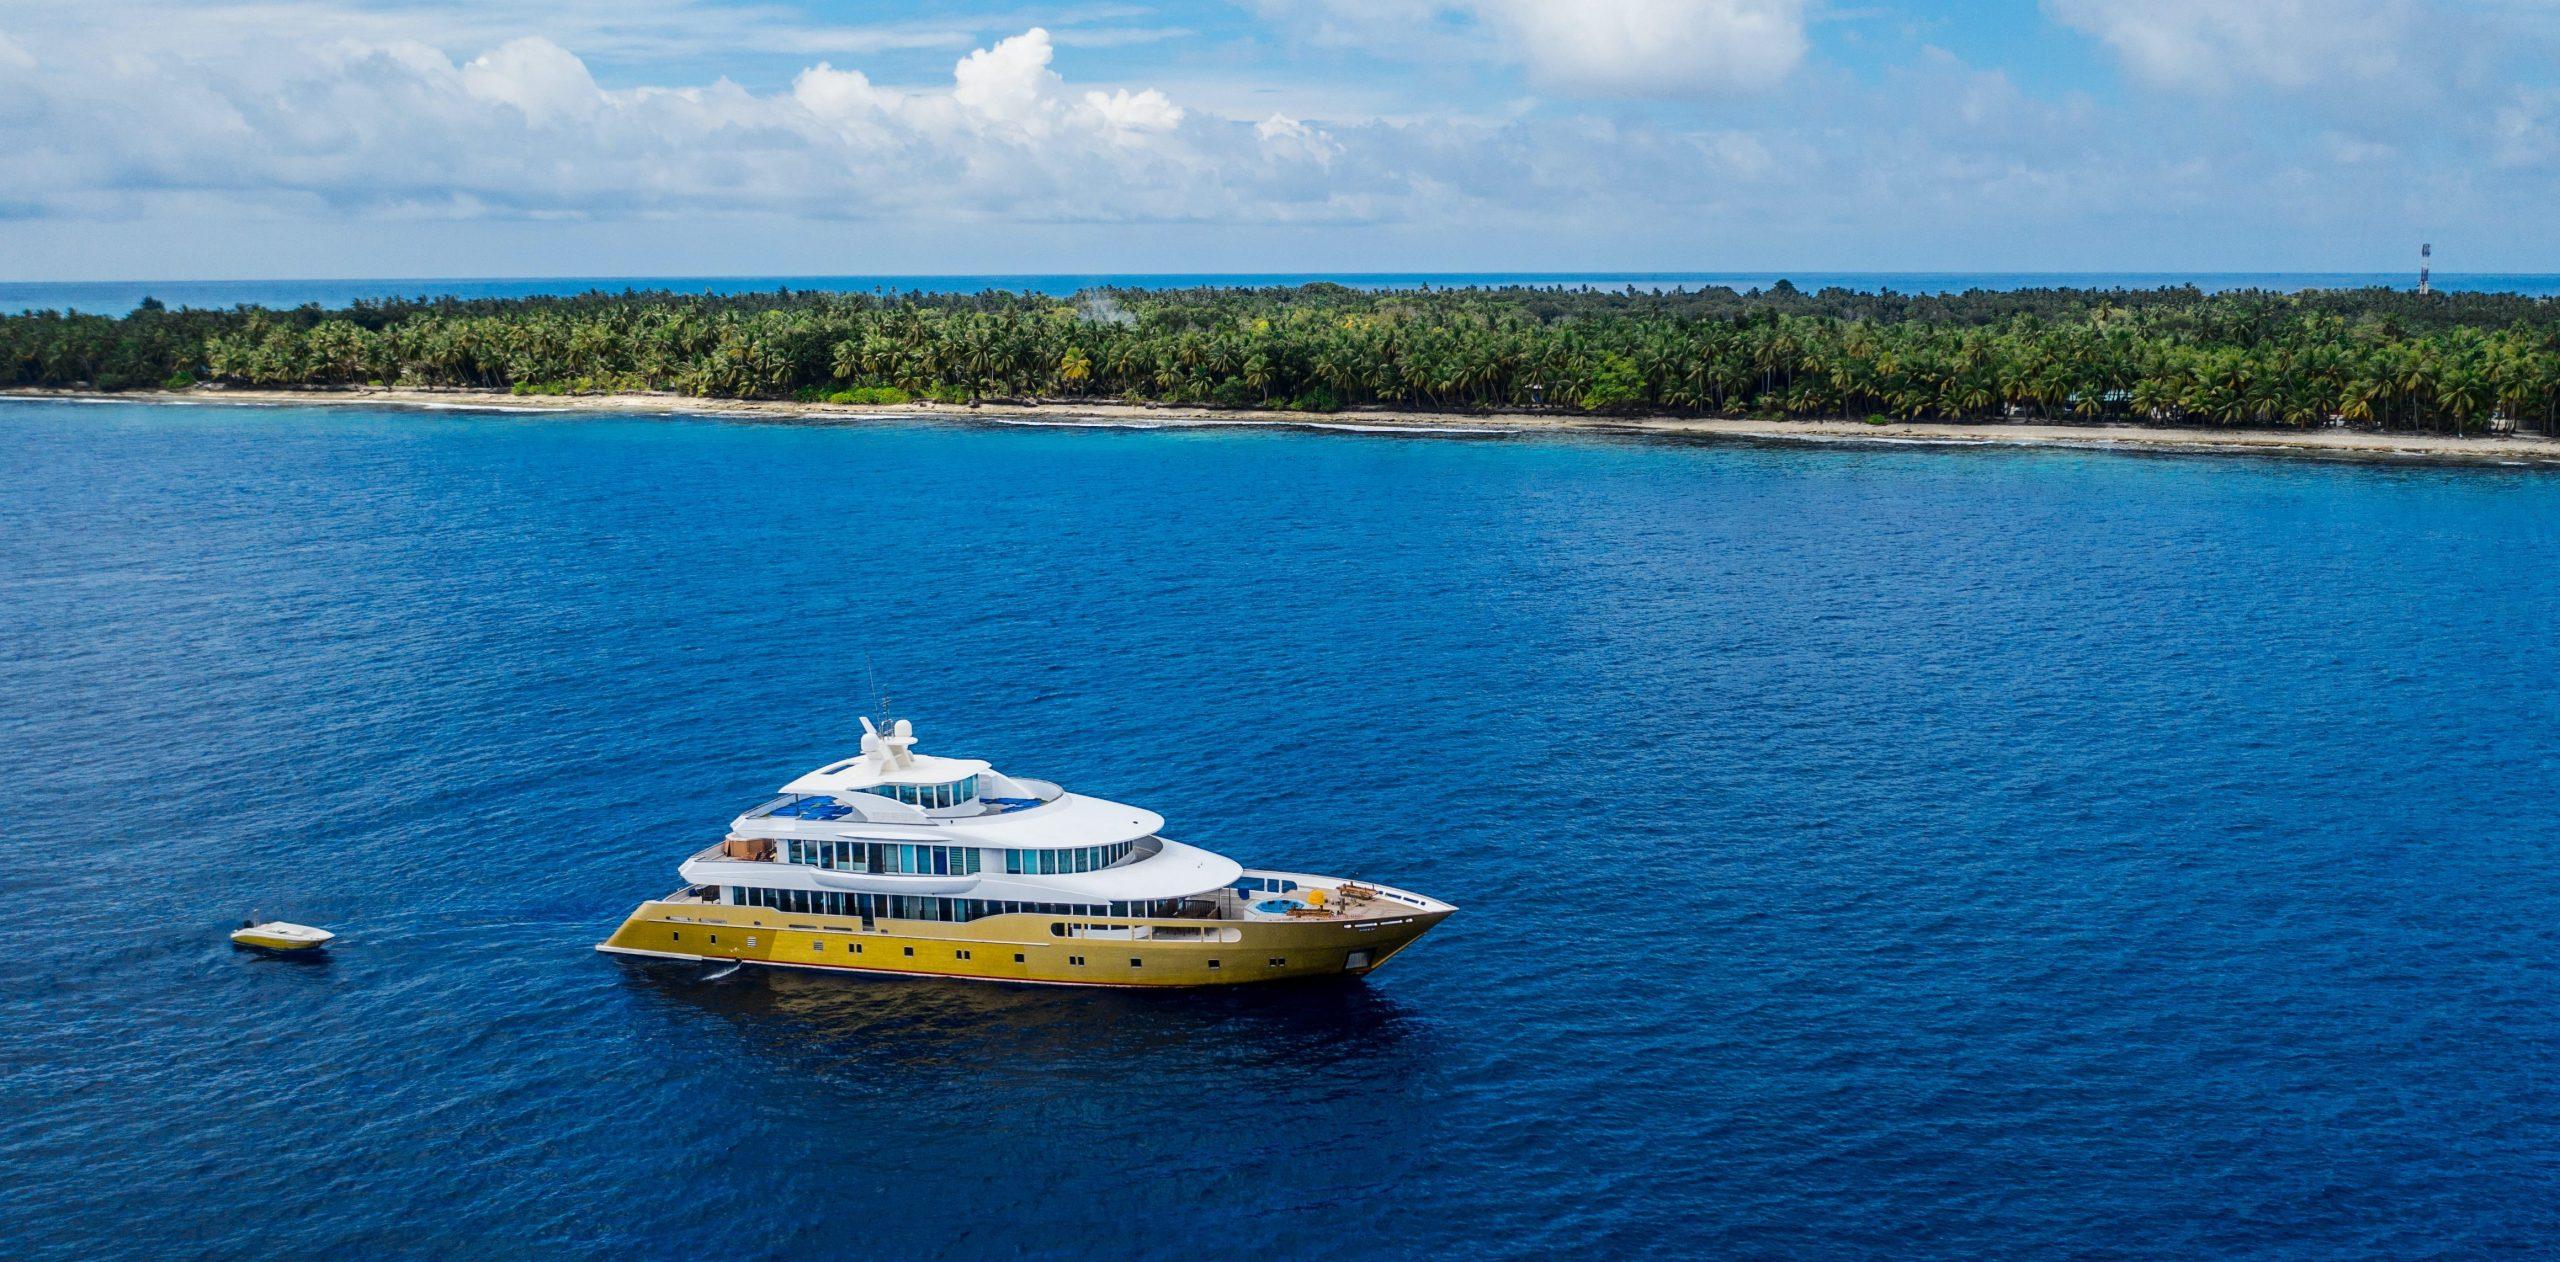 embarcación turística marítima